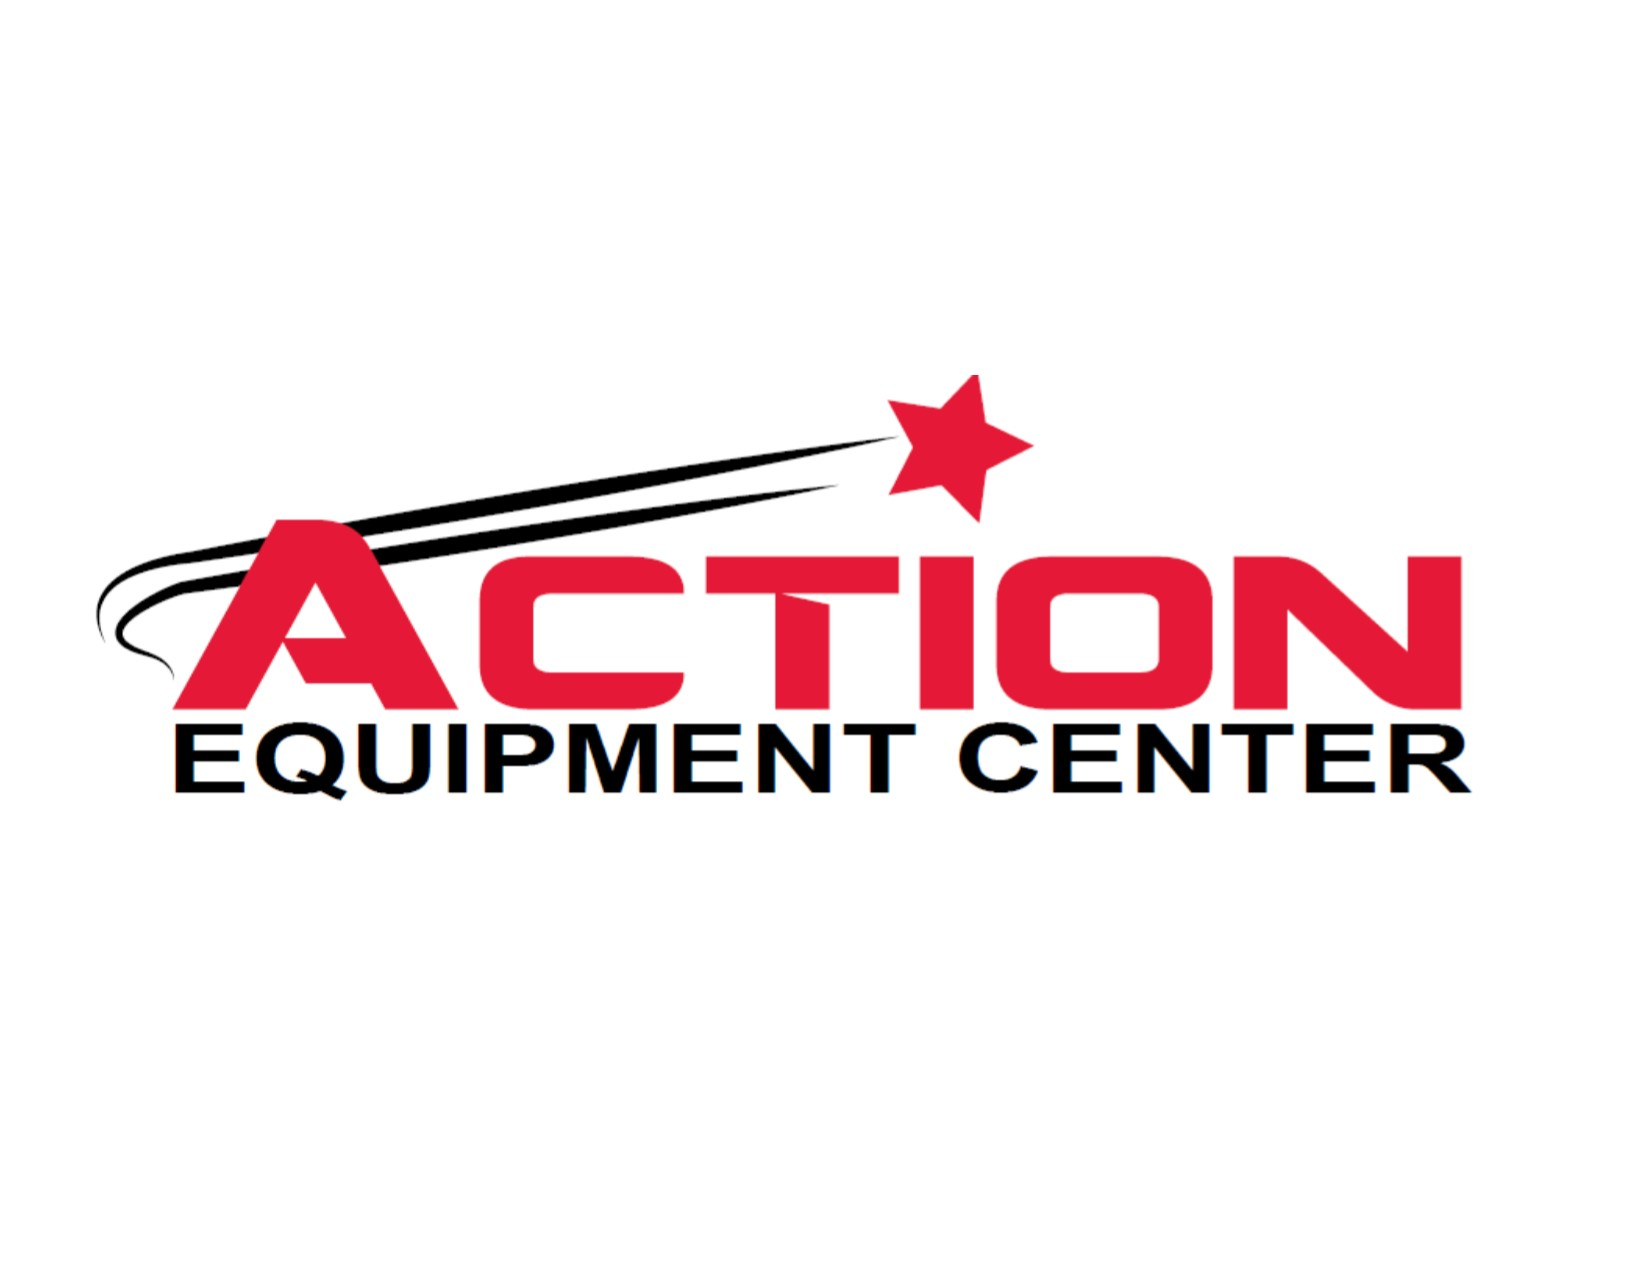 Action Equipment